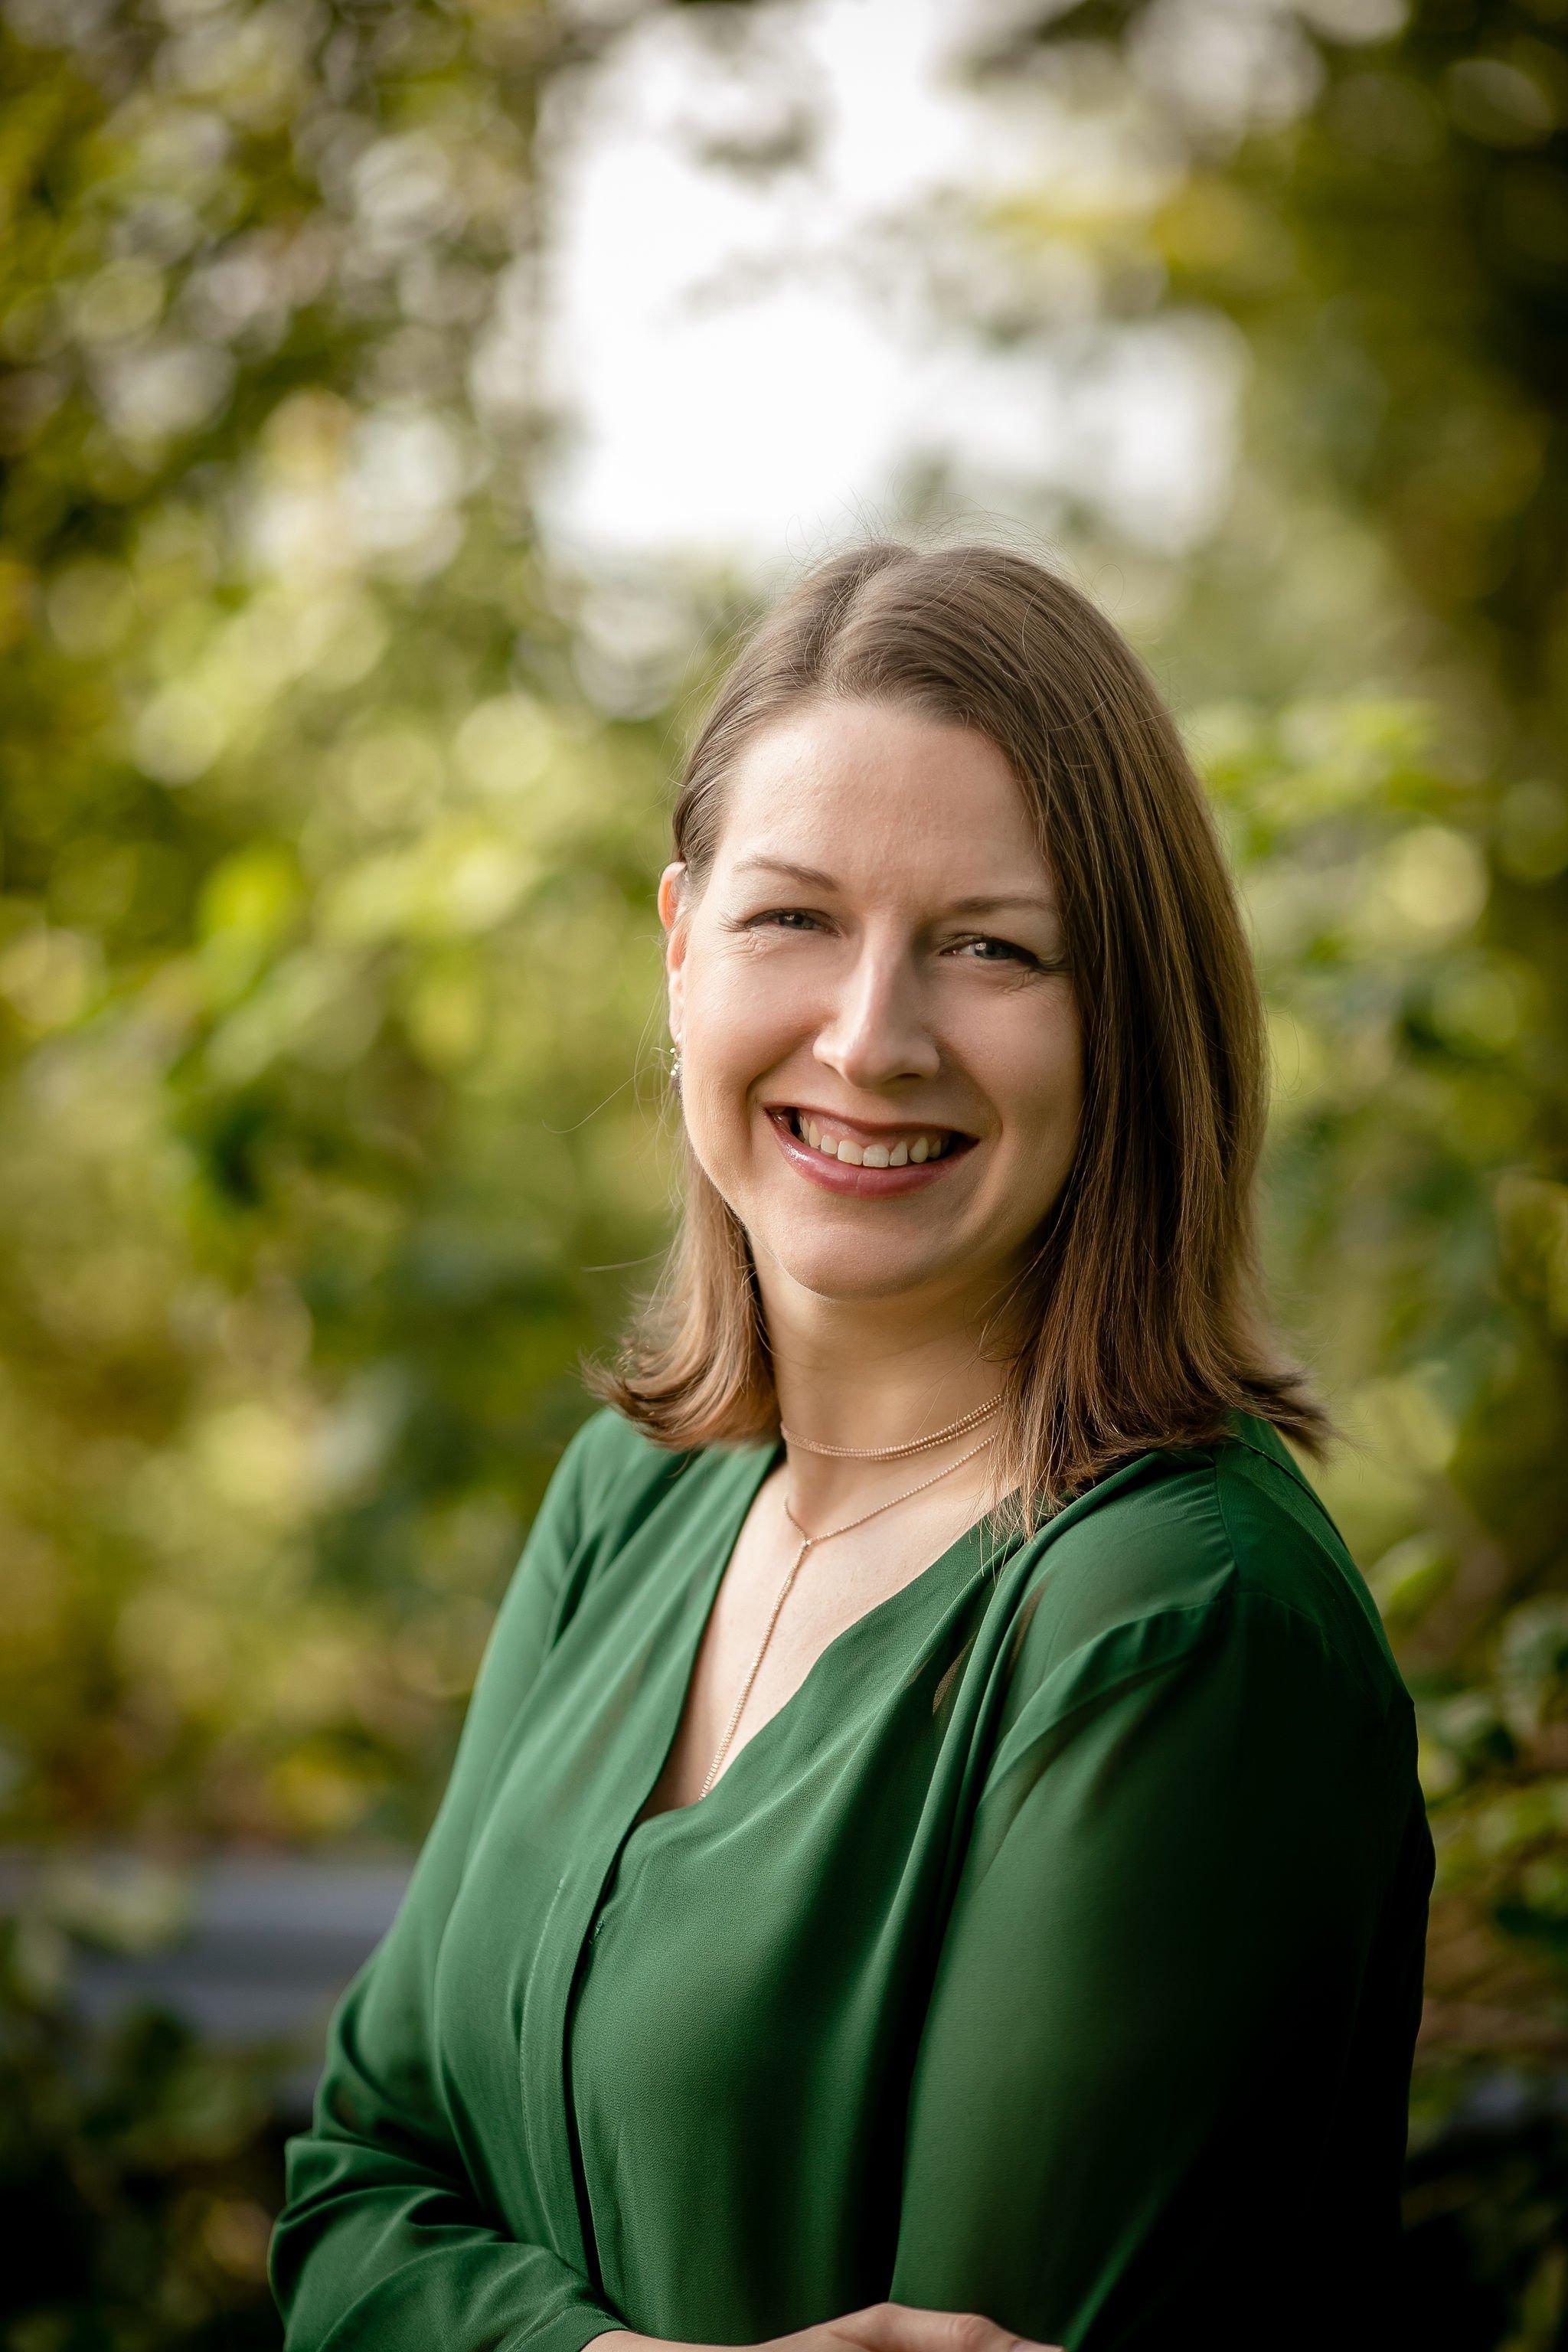 Senior Consultant Dr. Lindsey Lee